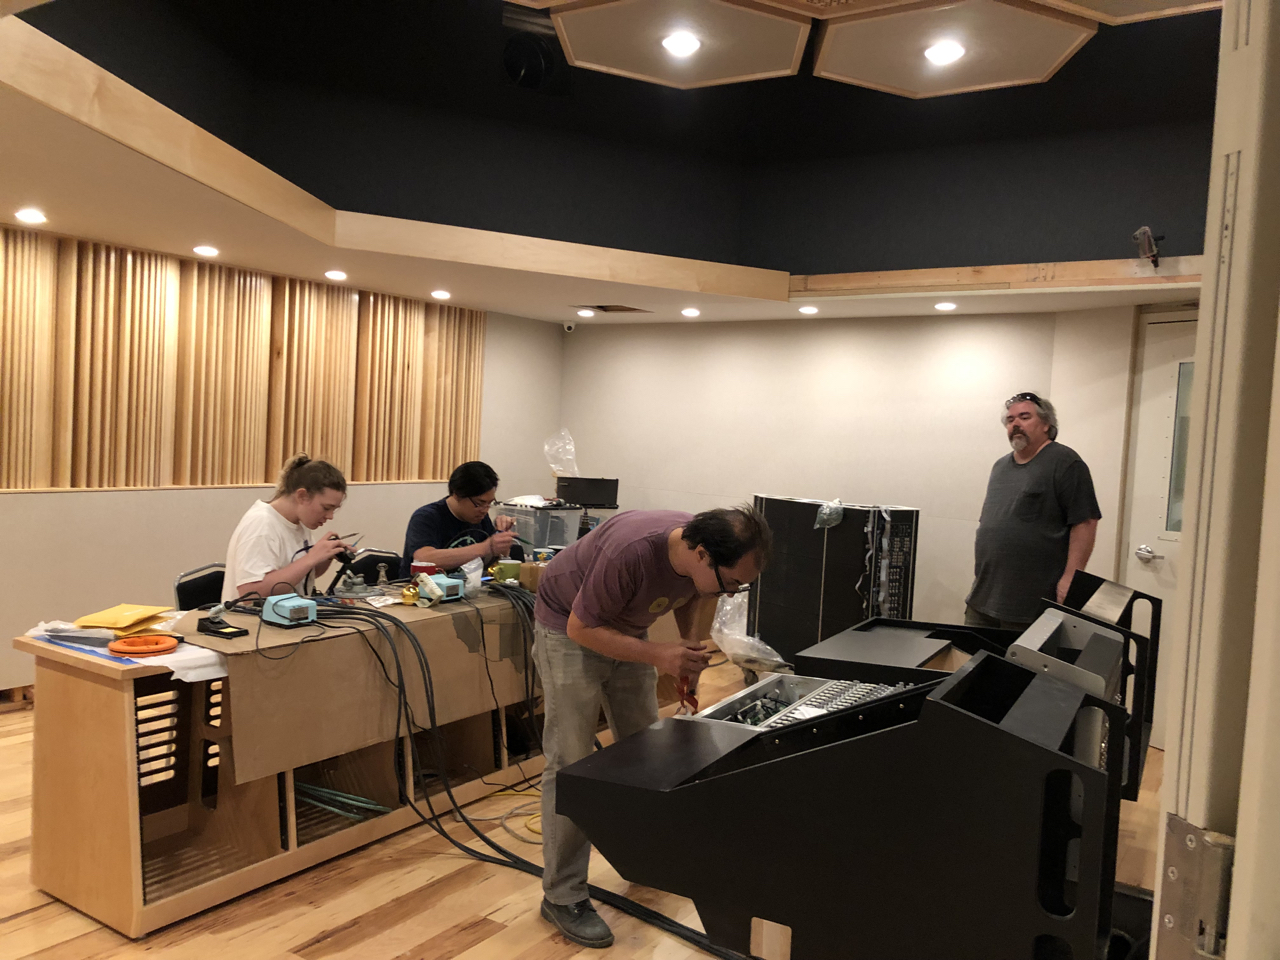 Maren, Ryan King, Thom Canova and Tony Brett working in control room 1.